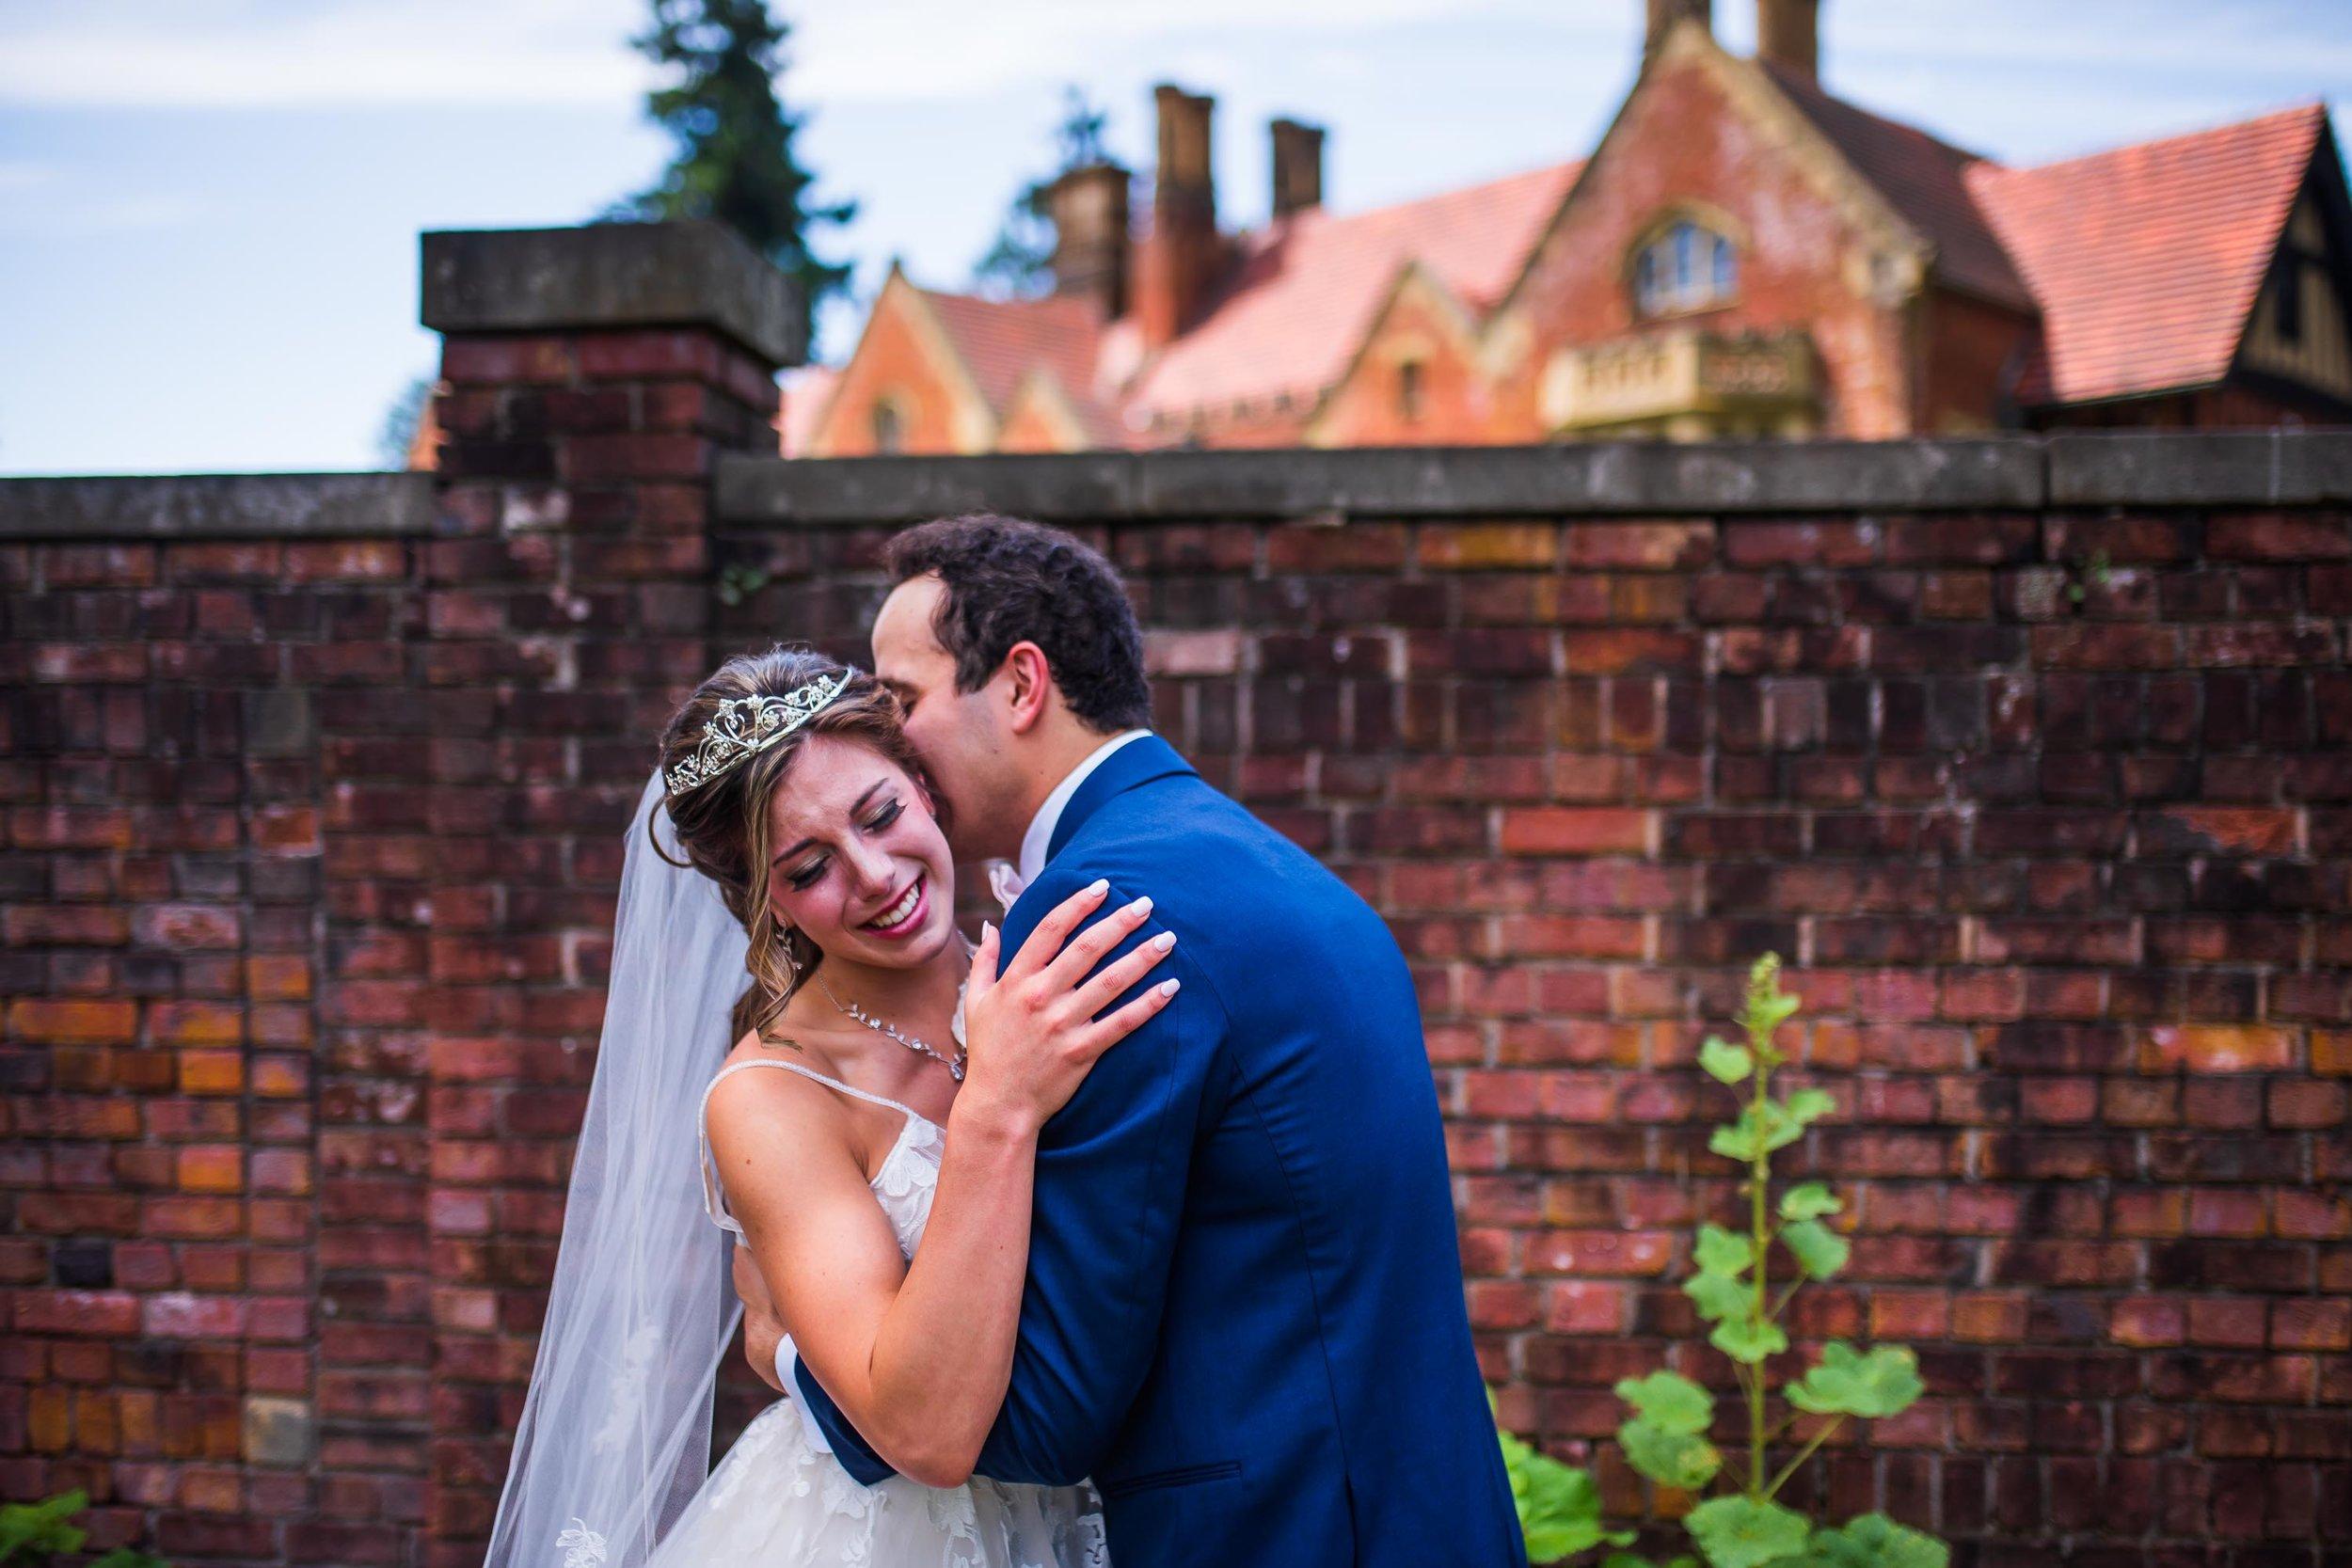 thornewood castle wedding 19.jpg